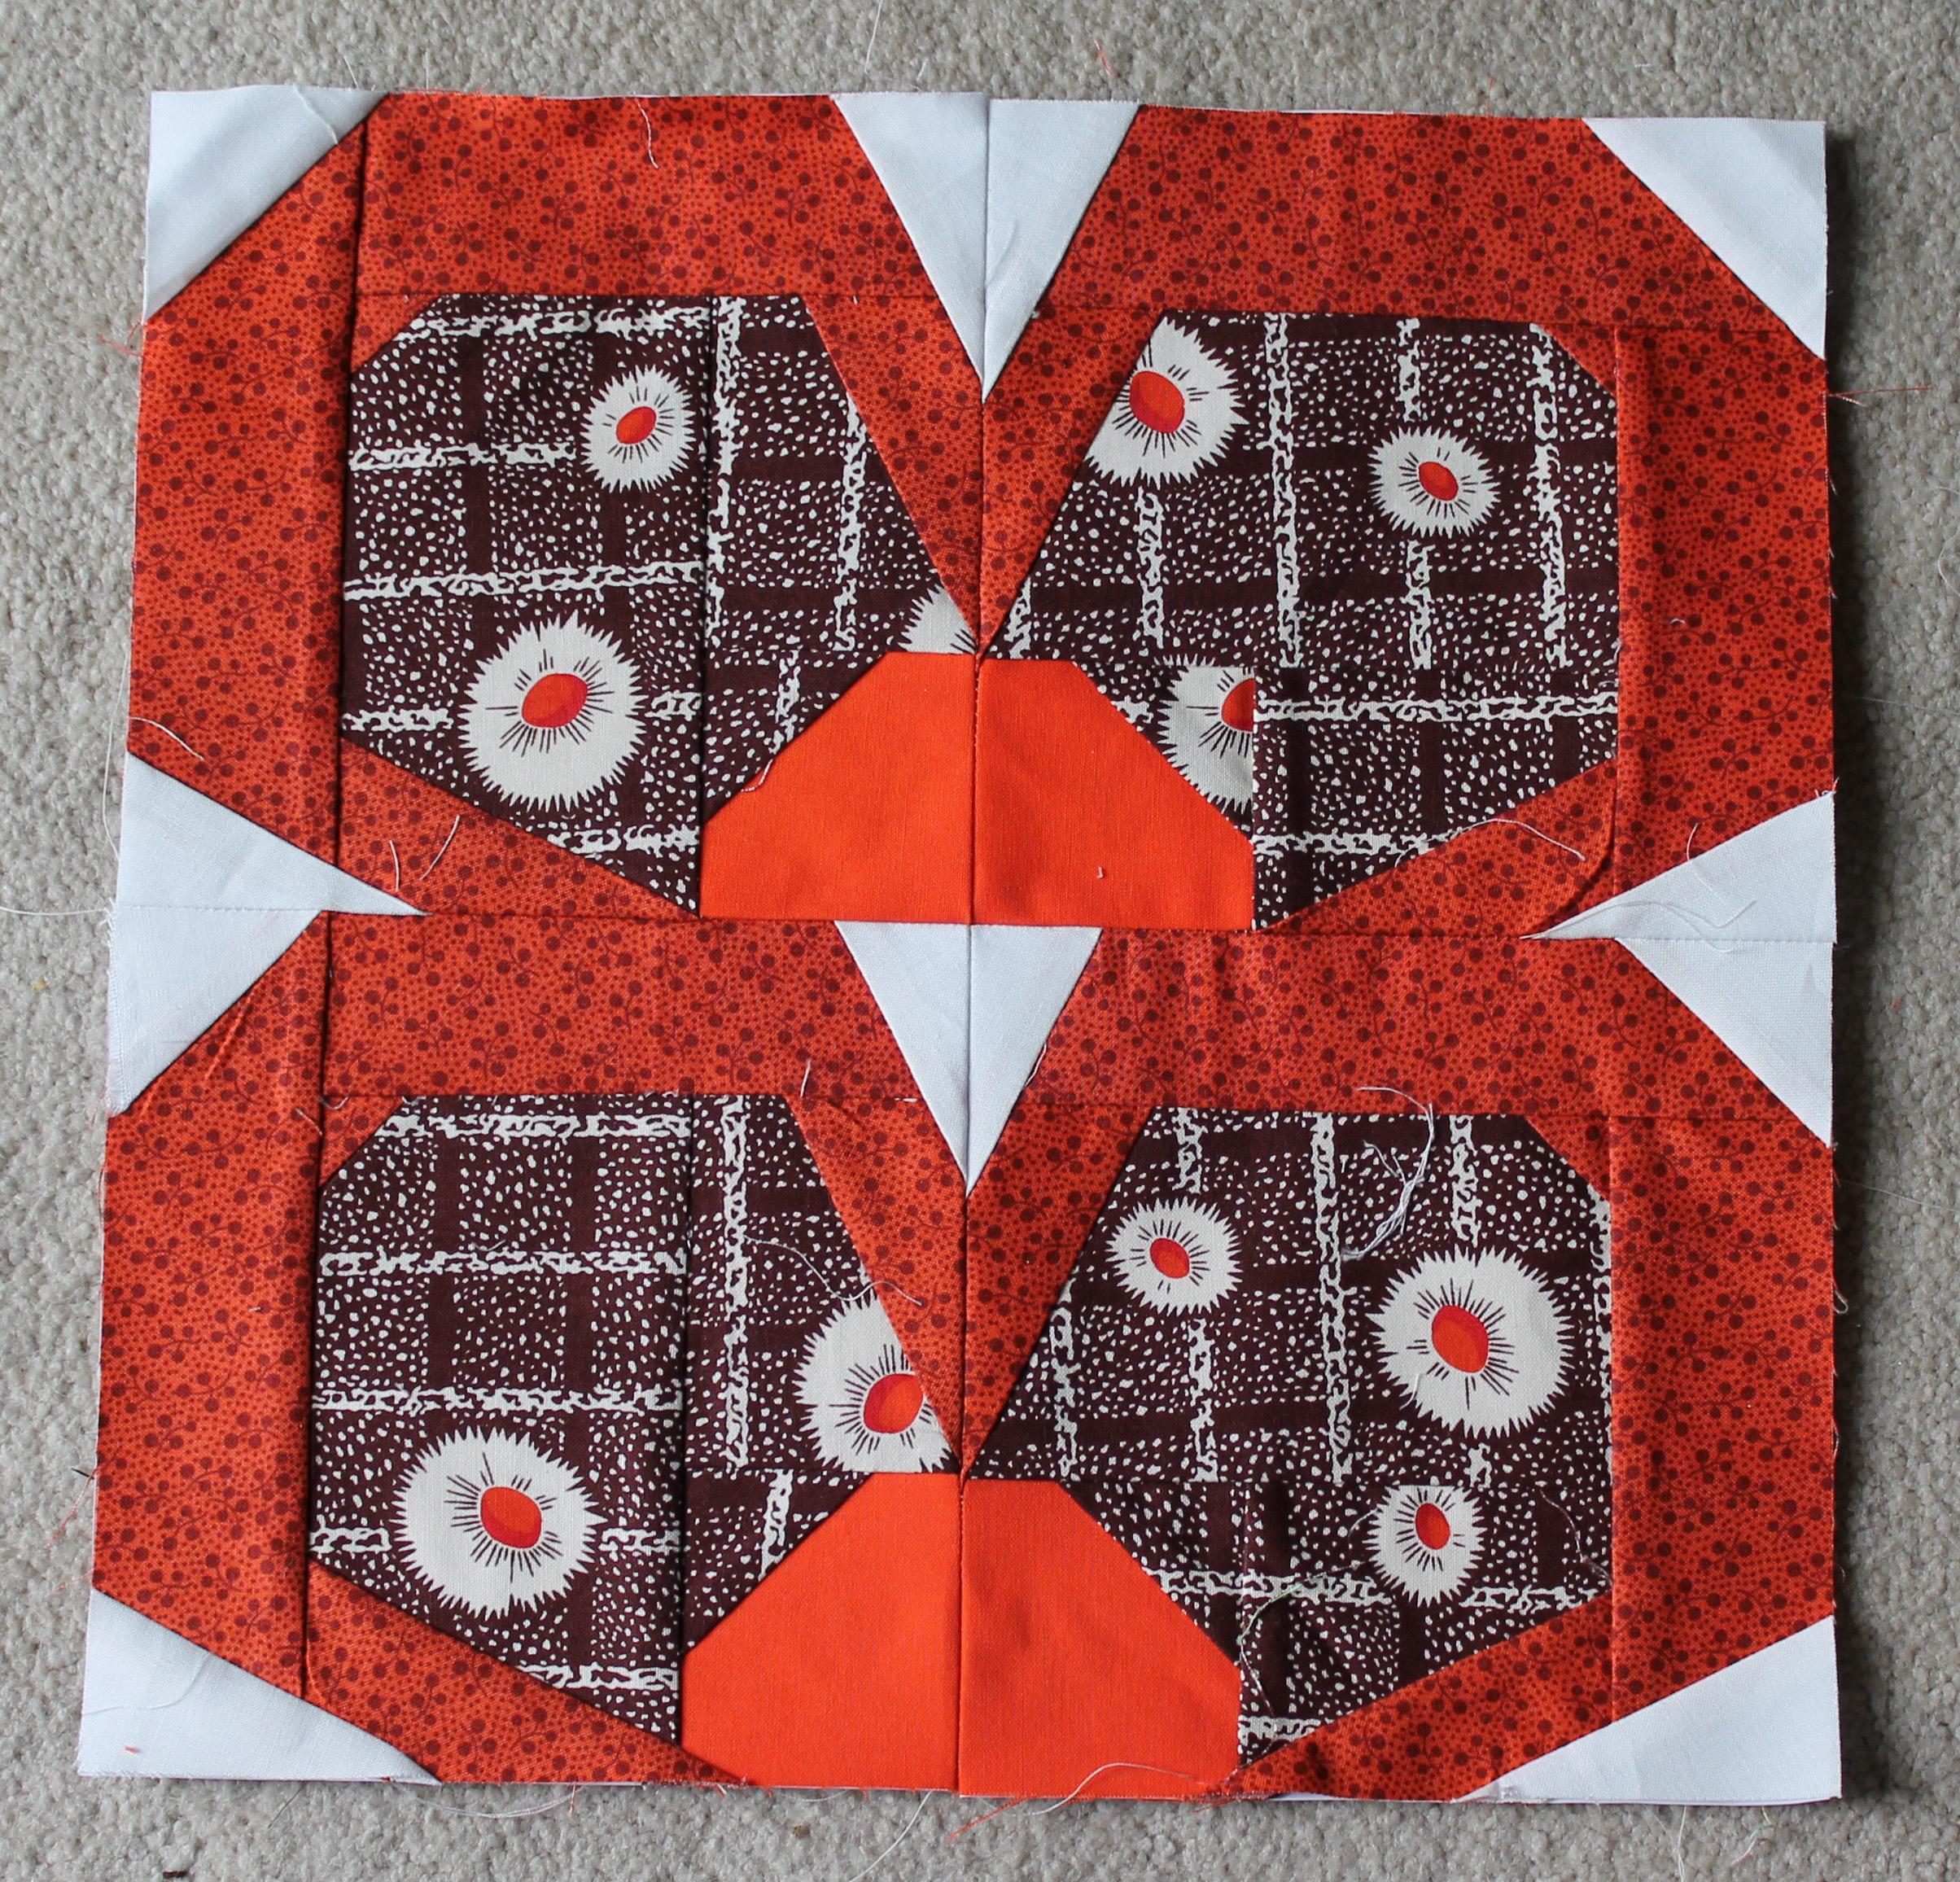 Zakka flower block wombat quilts so here is what a weeks worth of of zakka flowers looks like denyse schmidt paper pieced flowers mightylinksfo